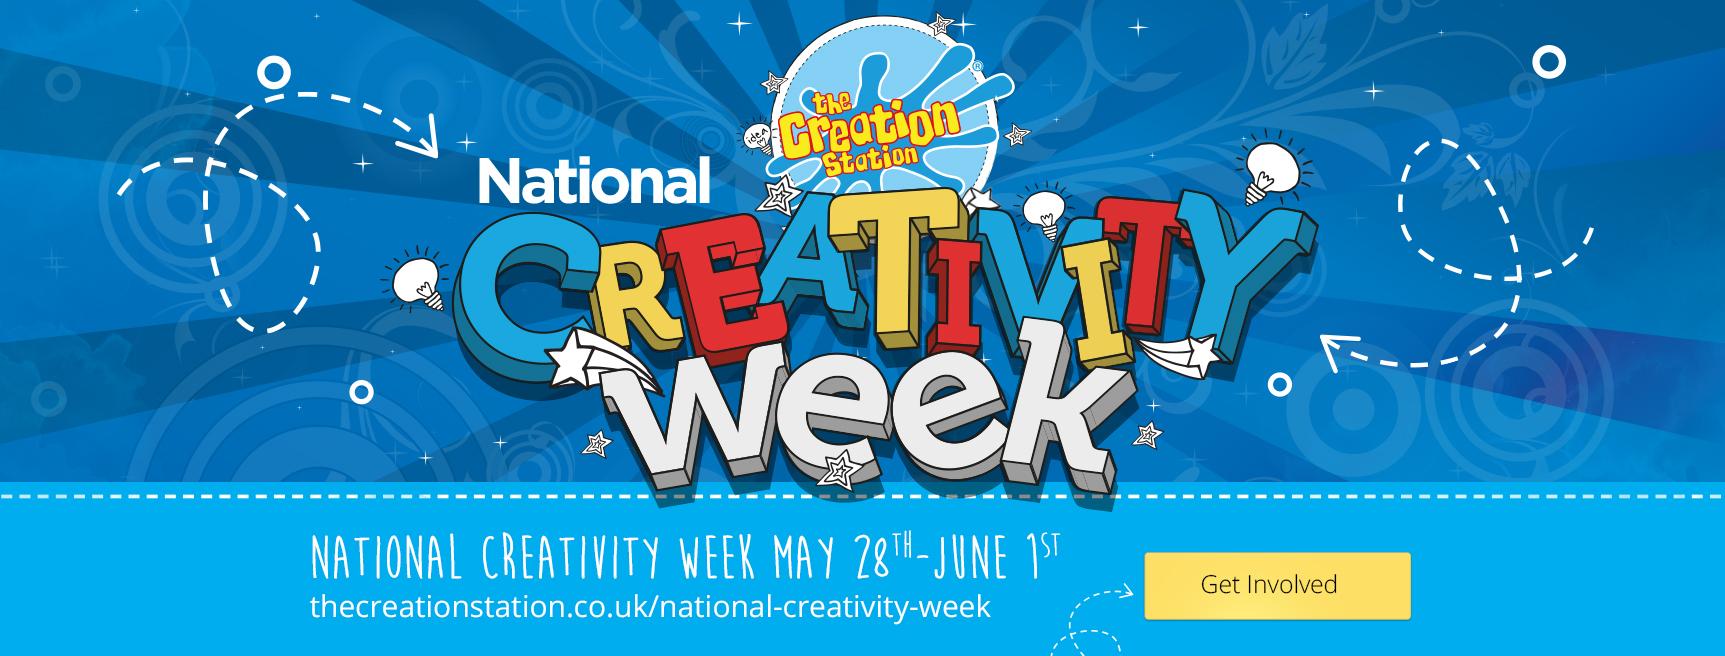 National Creativity week